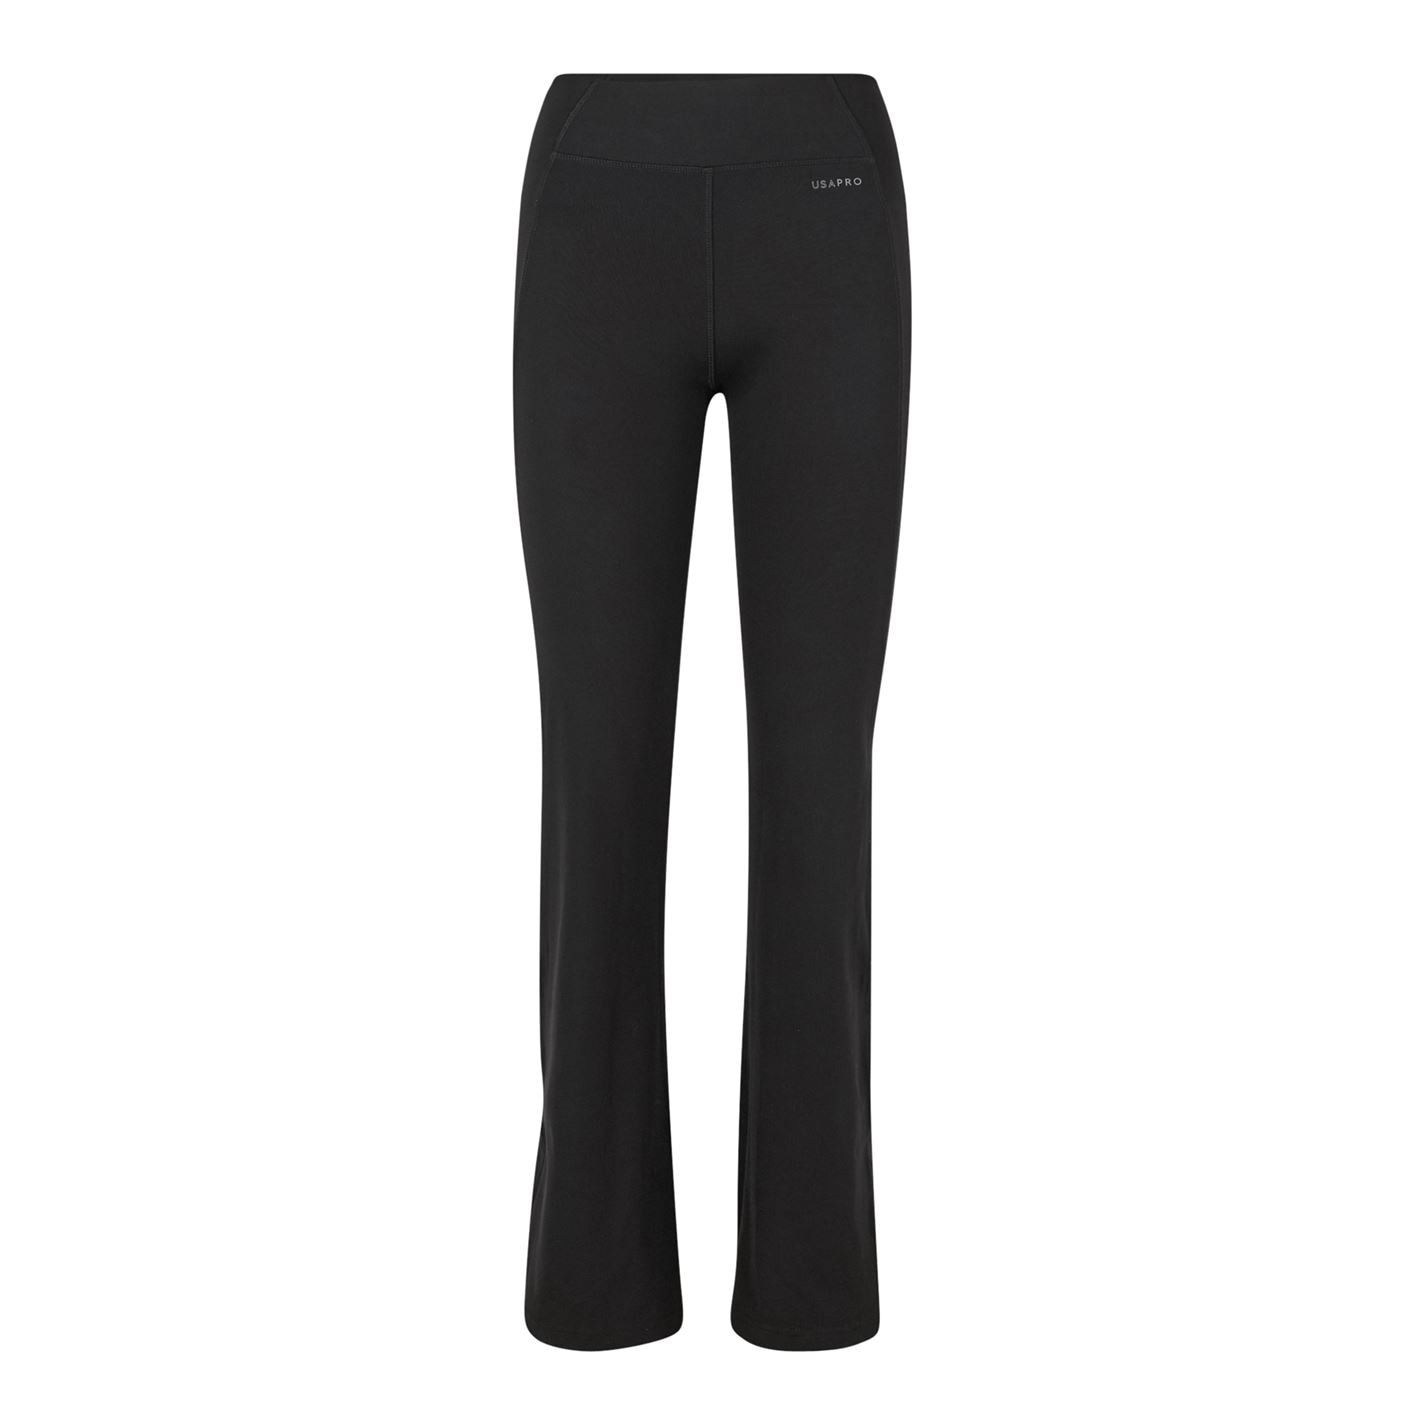 USA Pro Womens Ladies All Purpose Training Pants Trousers Bottoms Sports